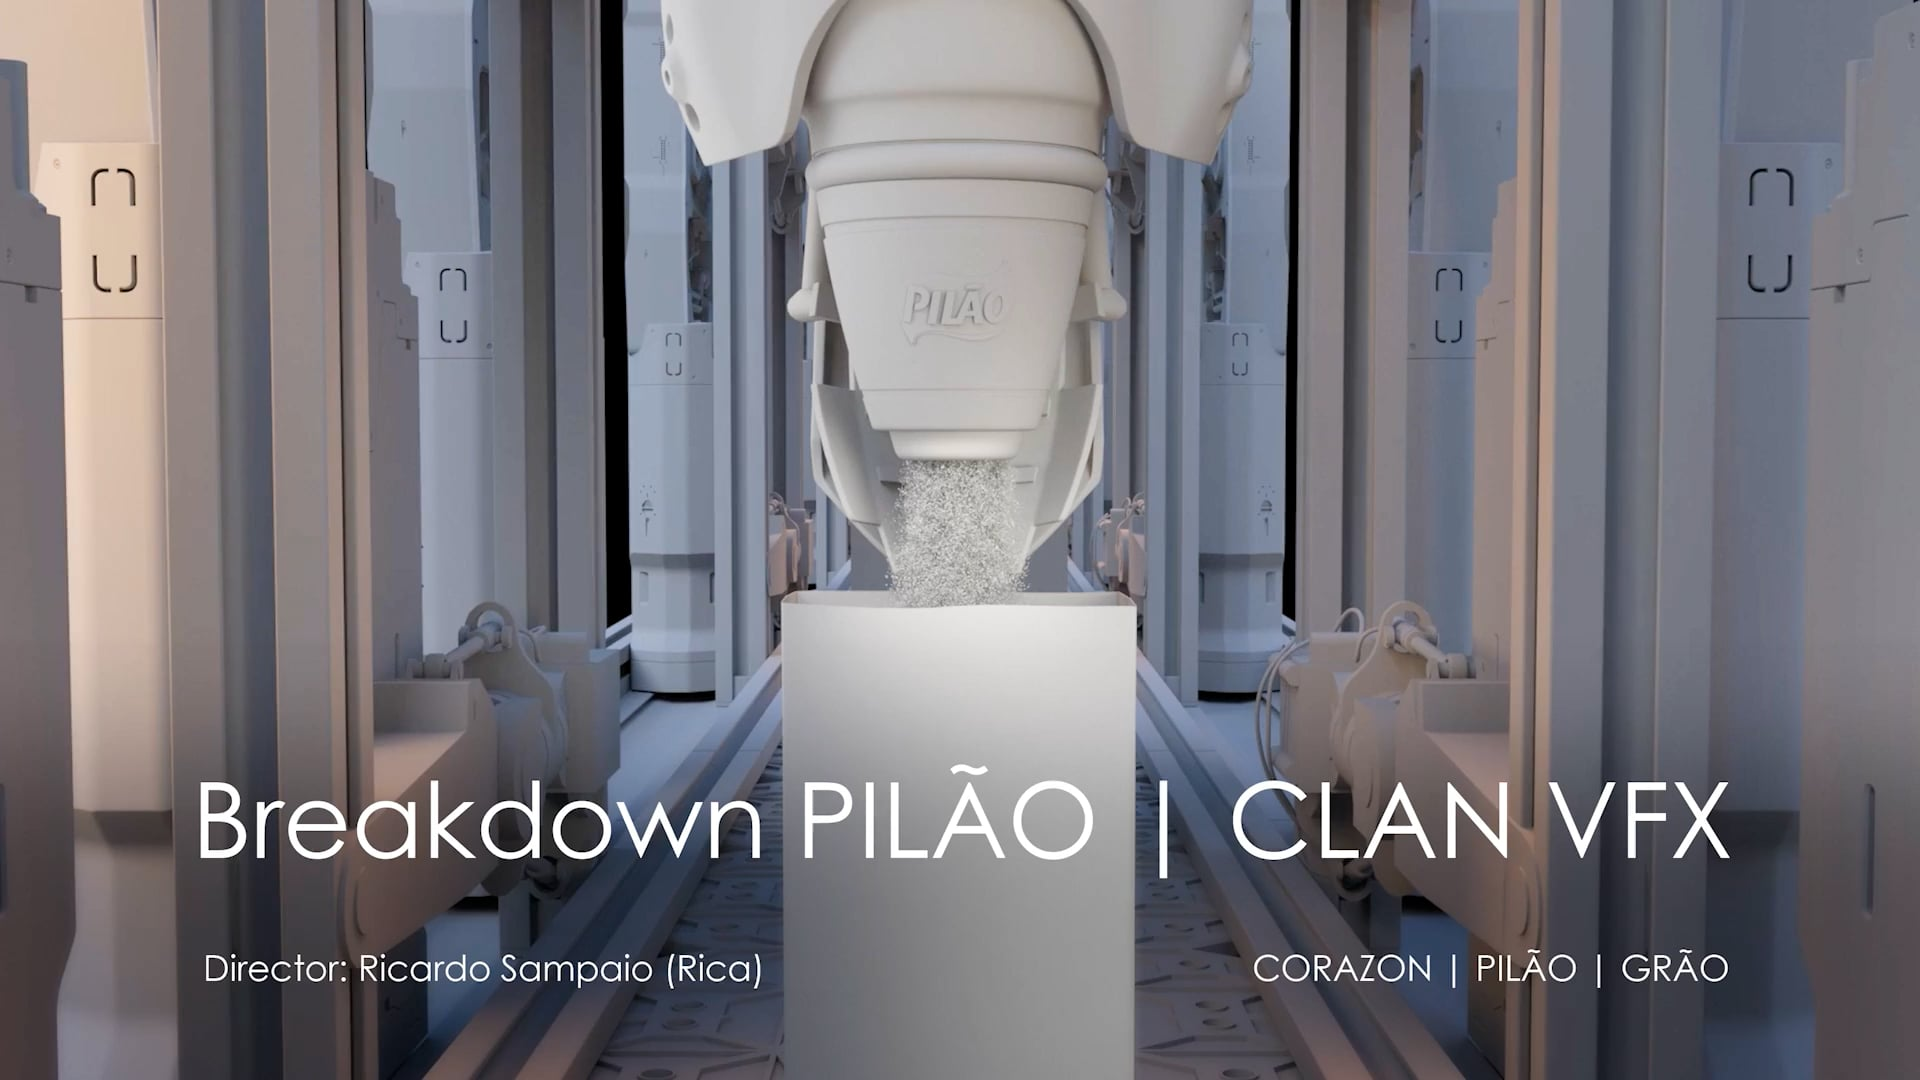 BREAKDOWN | PILÃO | CLAN VFX